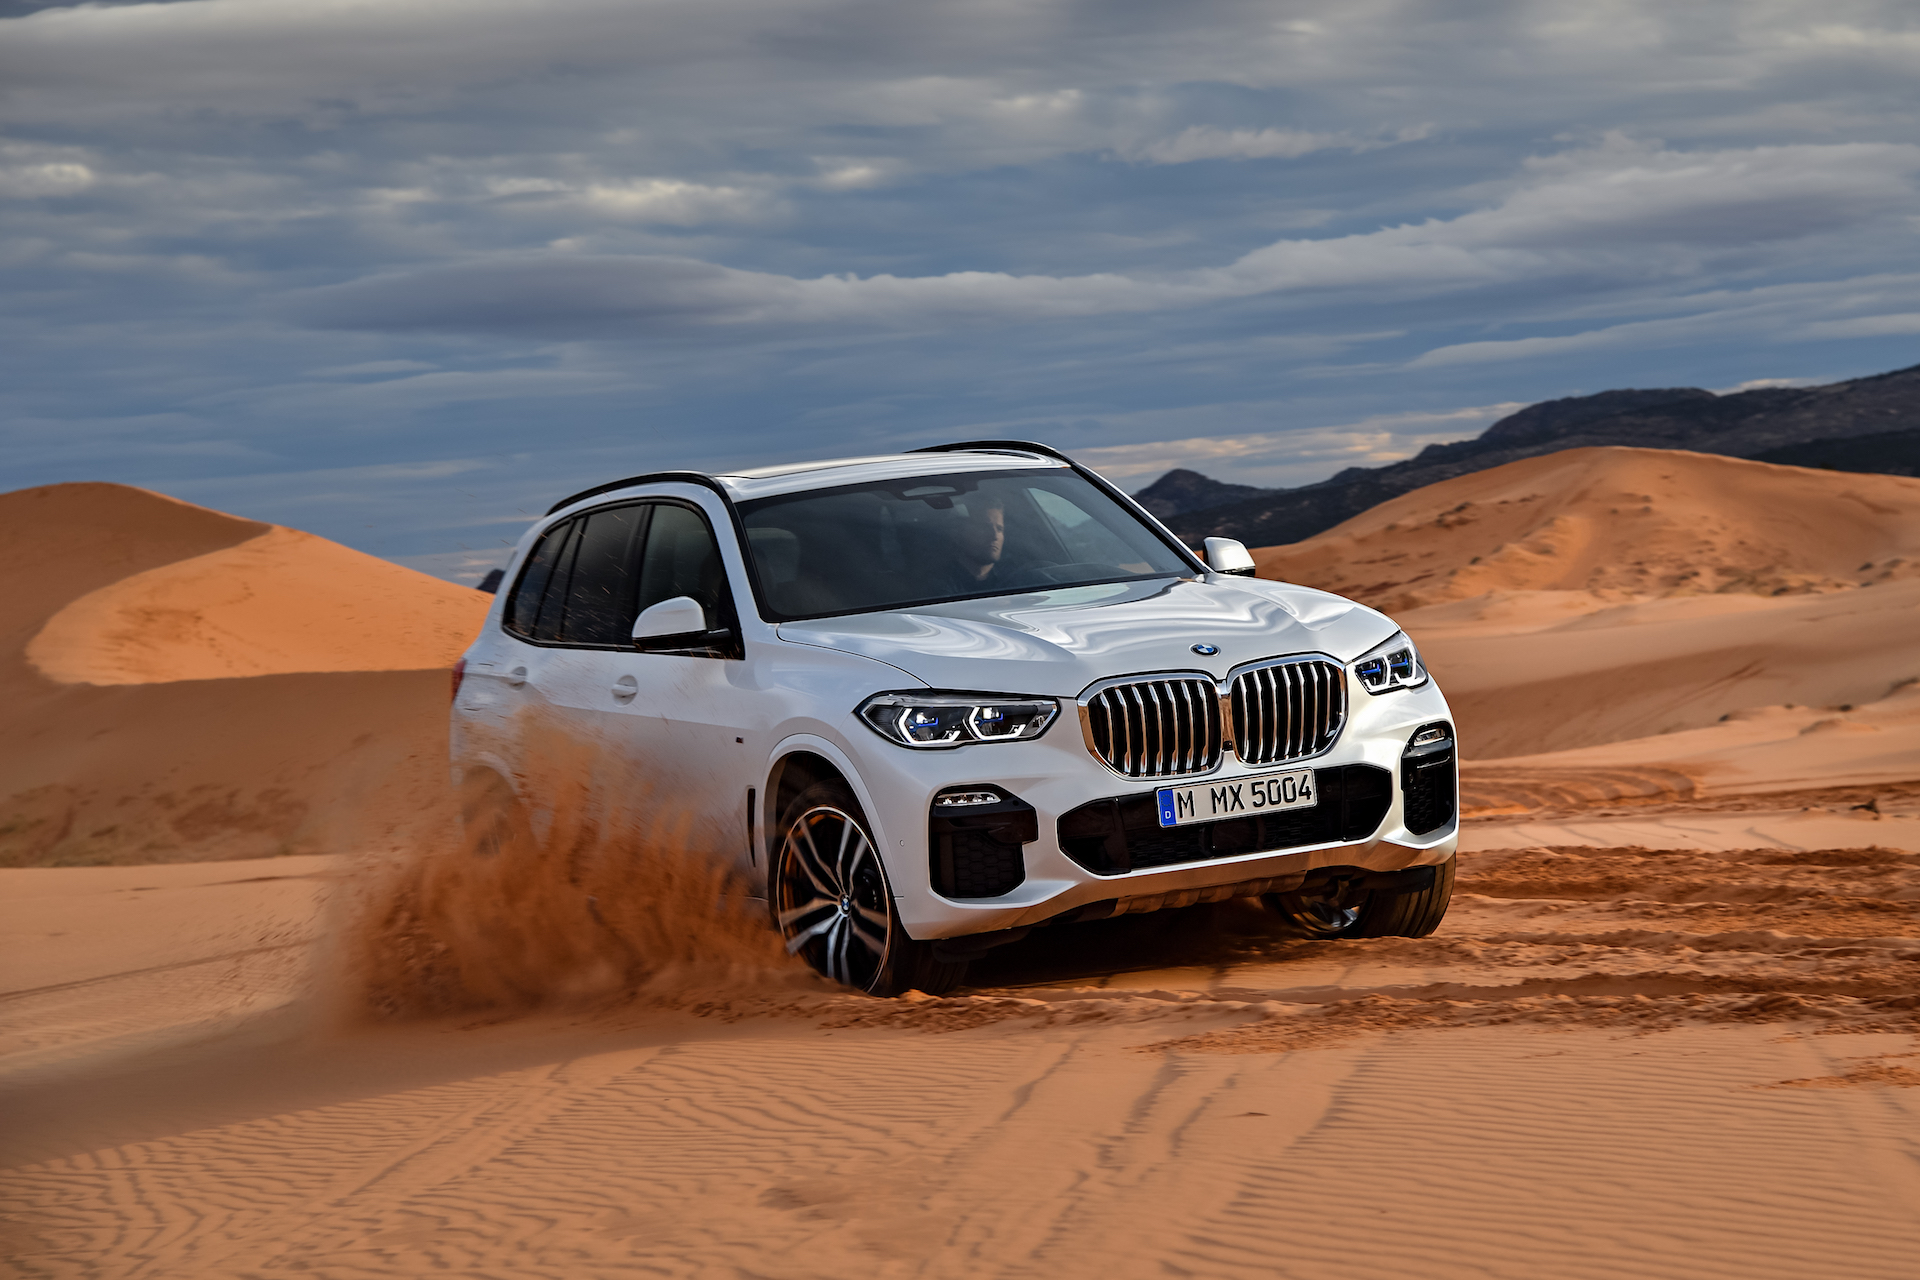 Nuova BMW X5 frontale in movimento su sabbia bianca